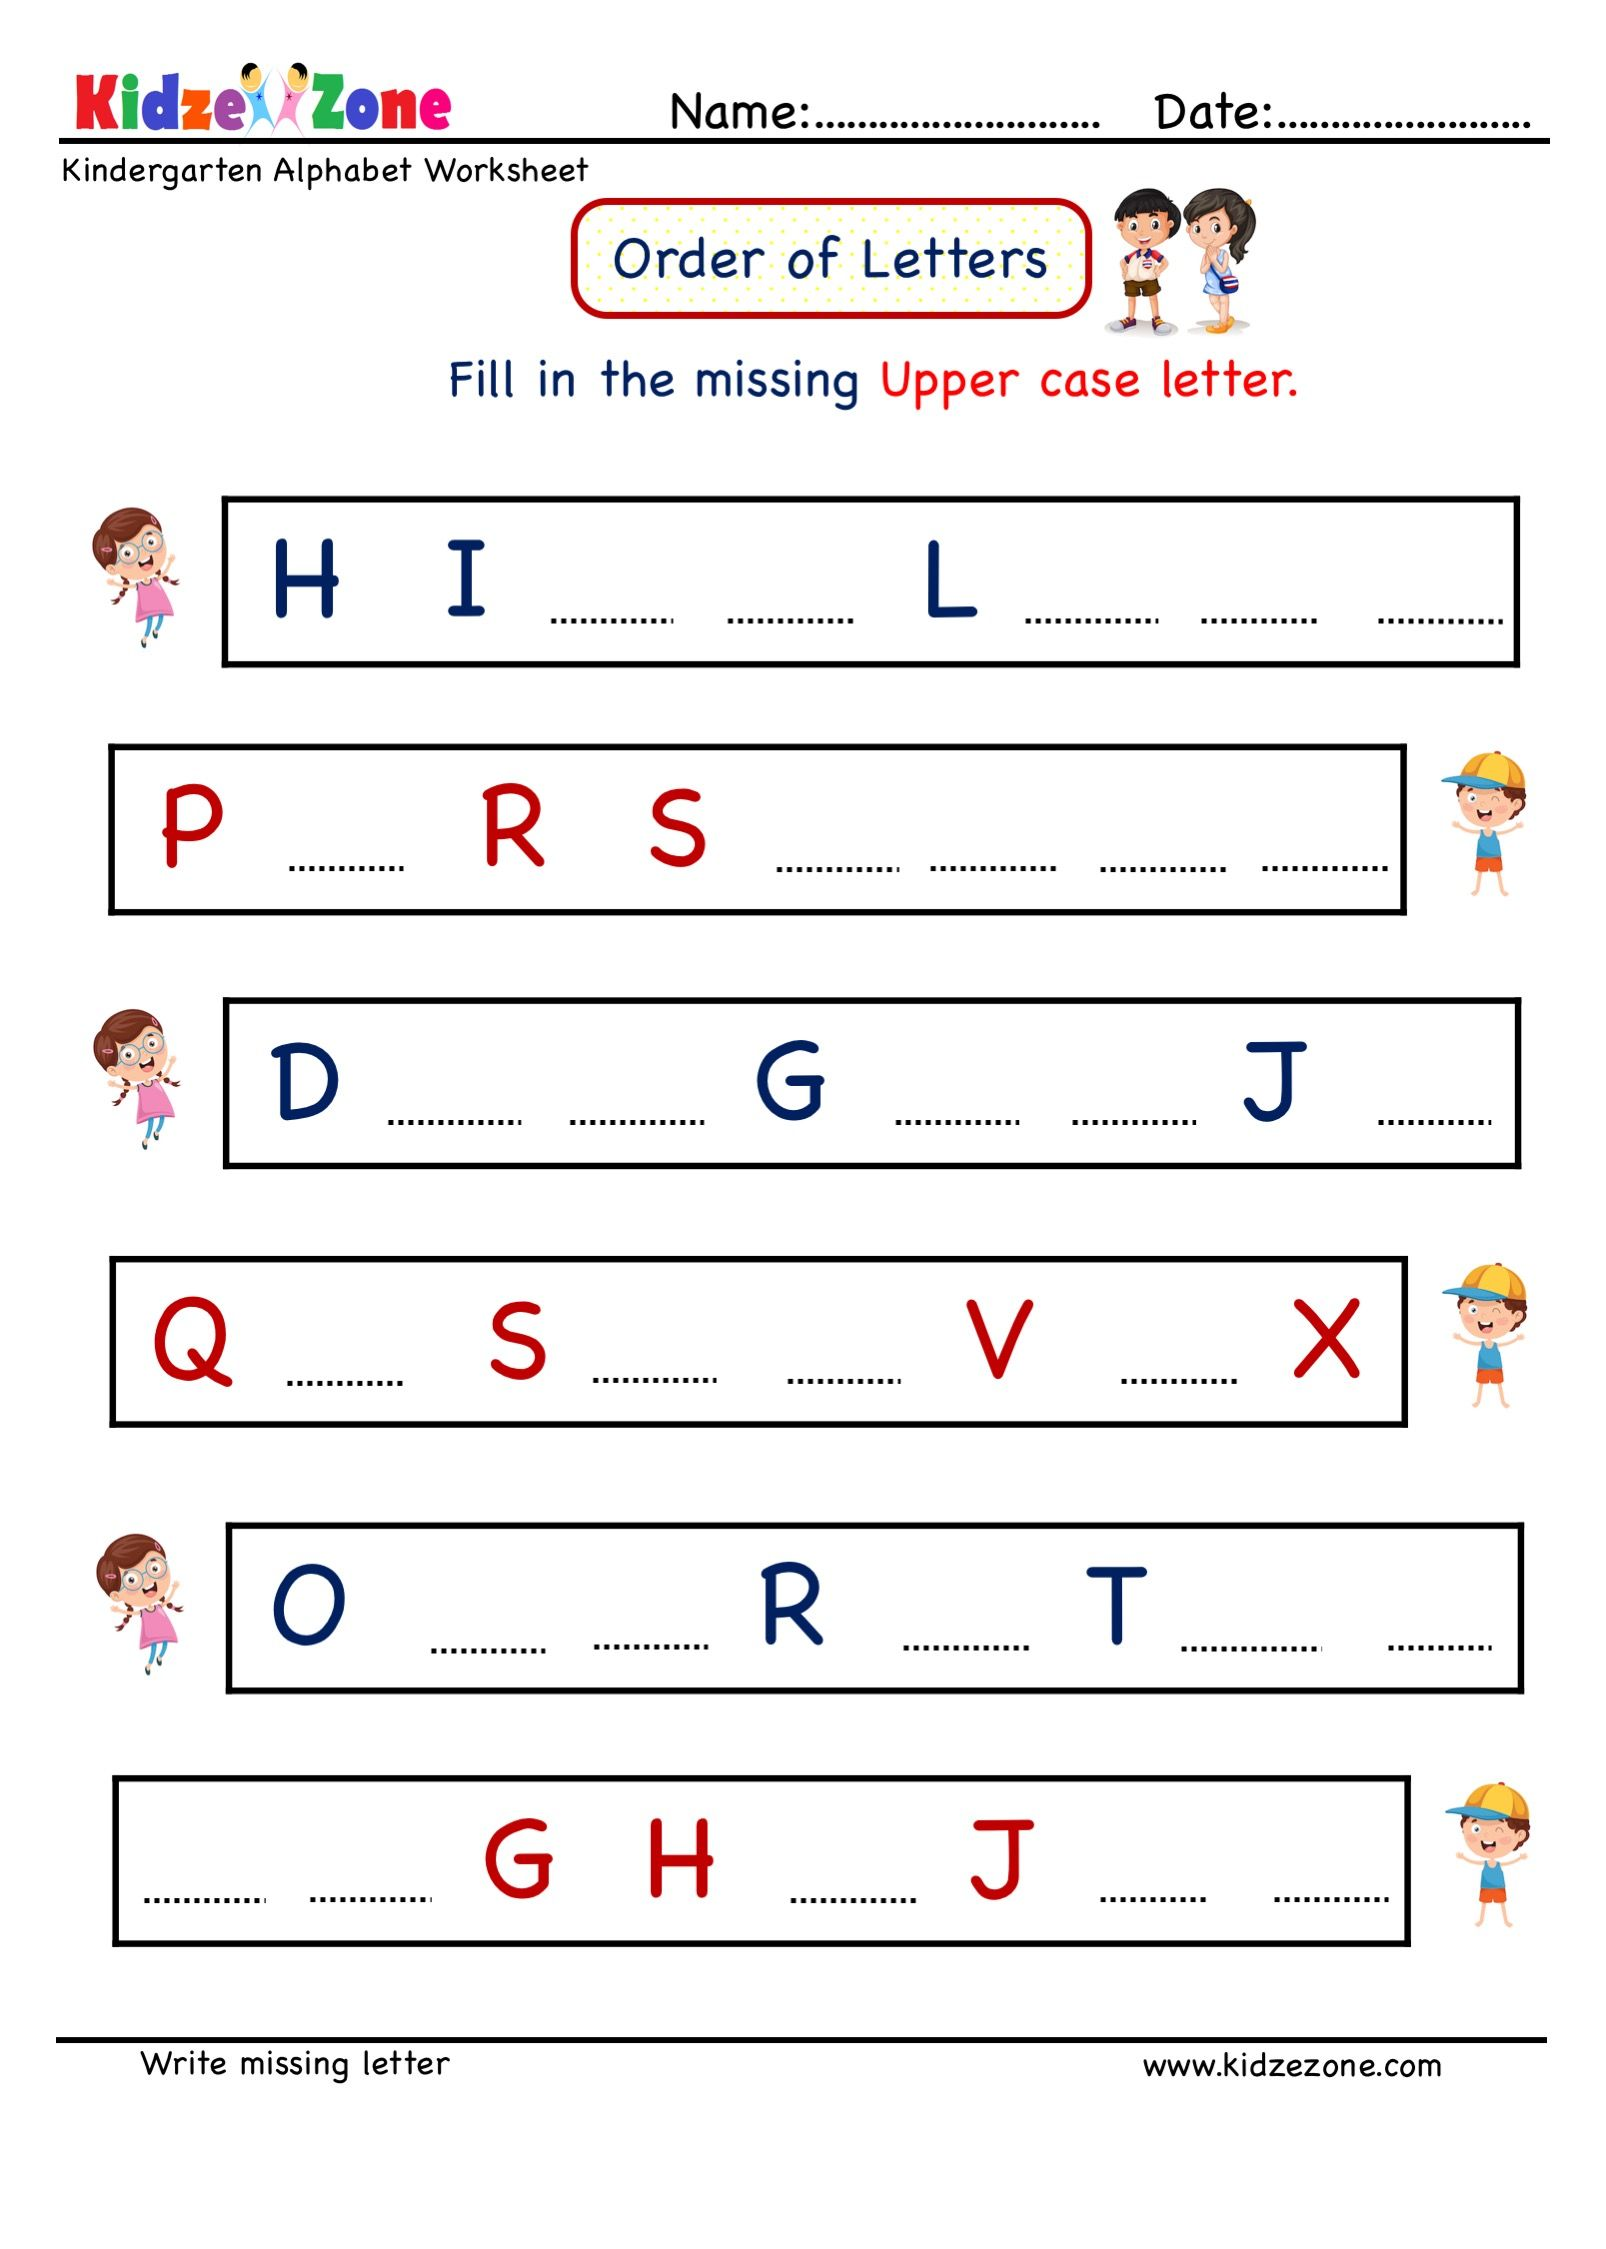 Fill Missing Upper Case Letter Kindergarten Worksheets In 2020 Letter Writing Worksheets Alphabet Worksheets Kindergarten Letter Worksheets